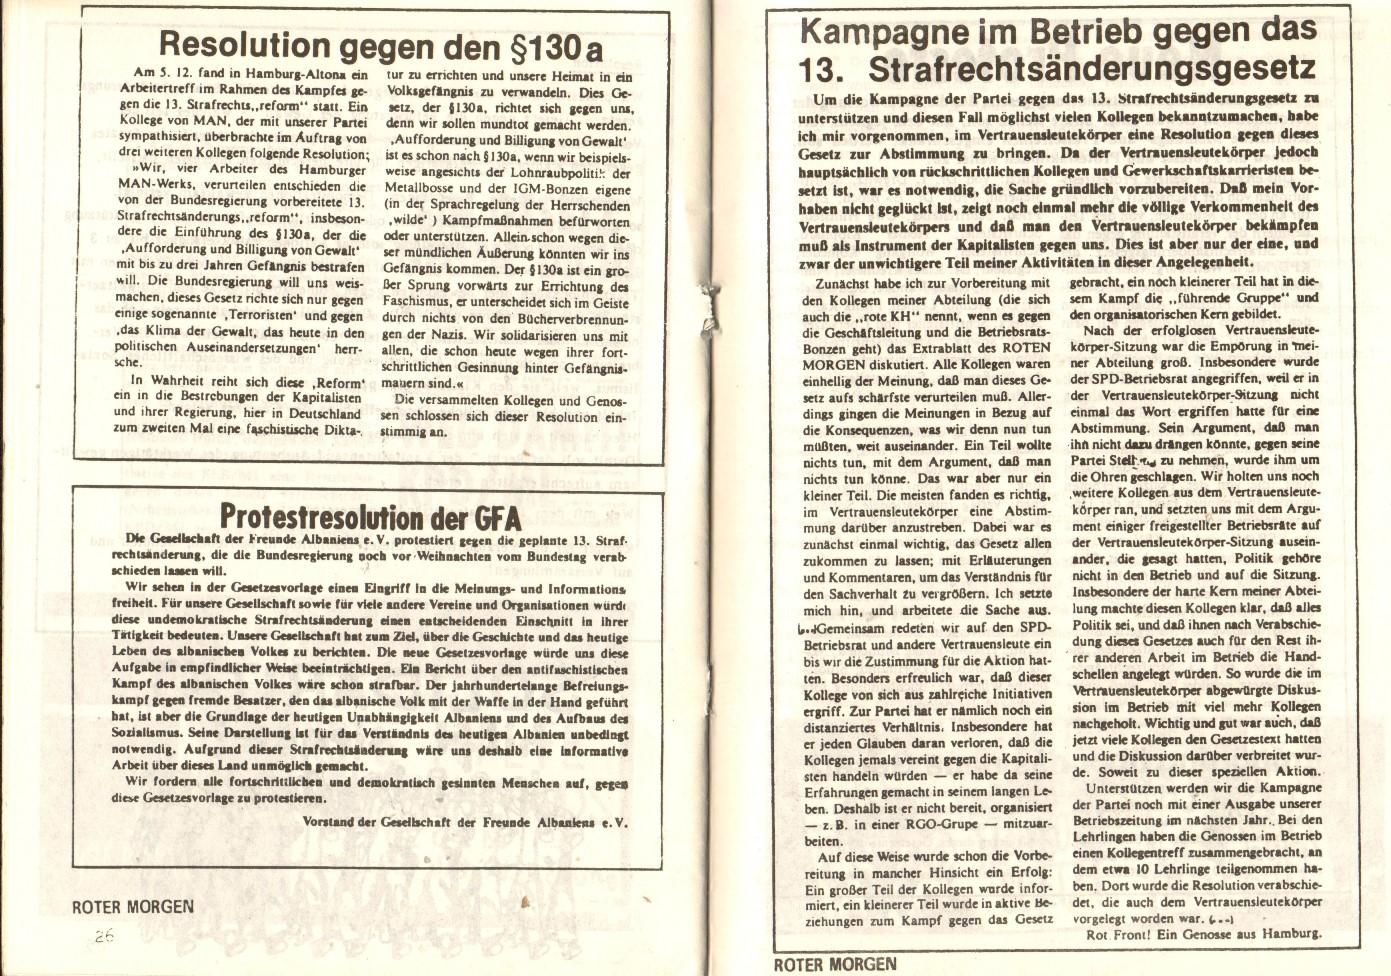 RHD_1976_Doku_Strafrechtsaenderungsgesetz_14